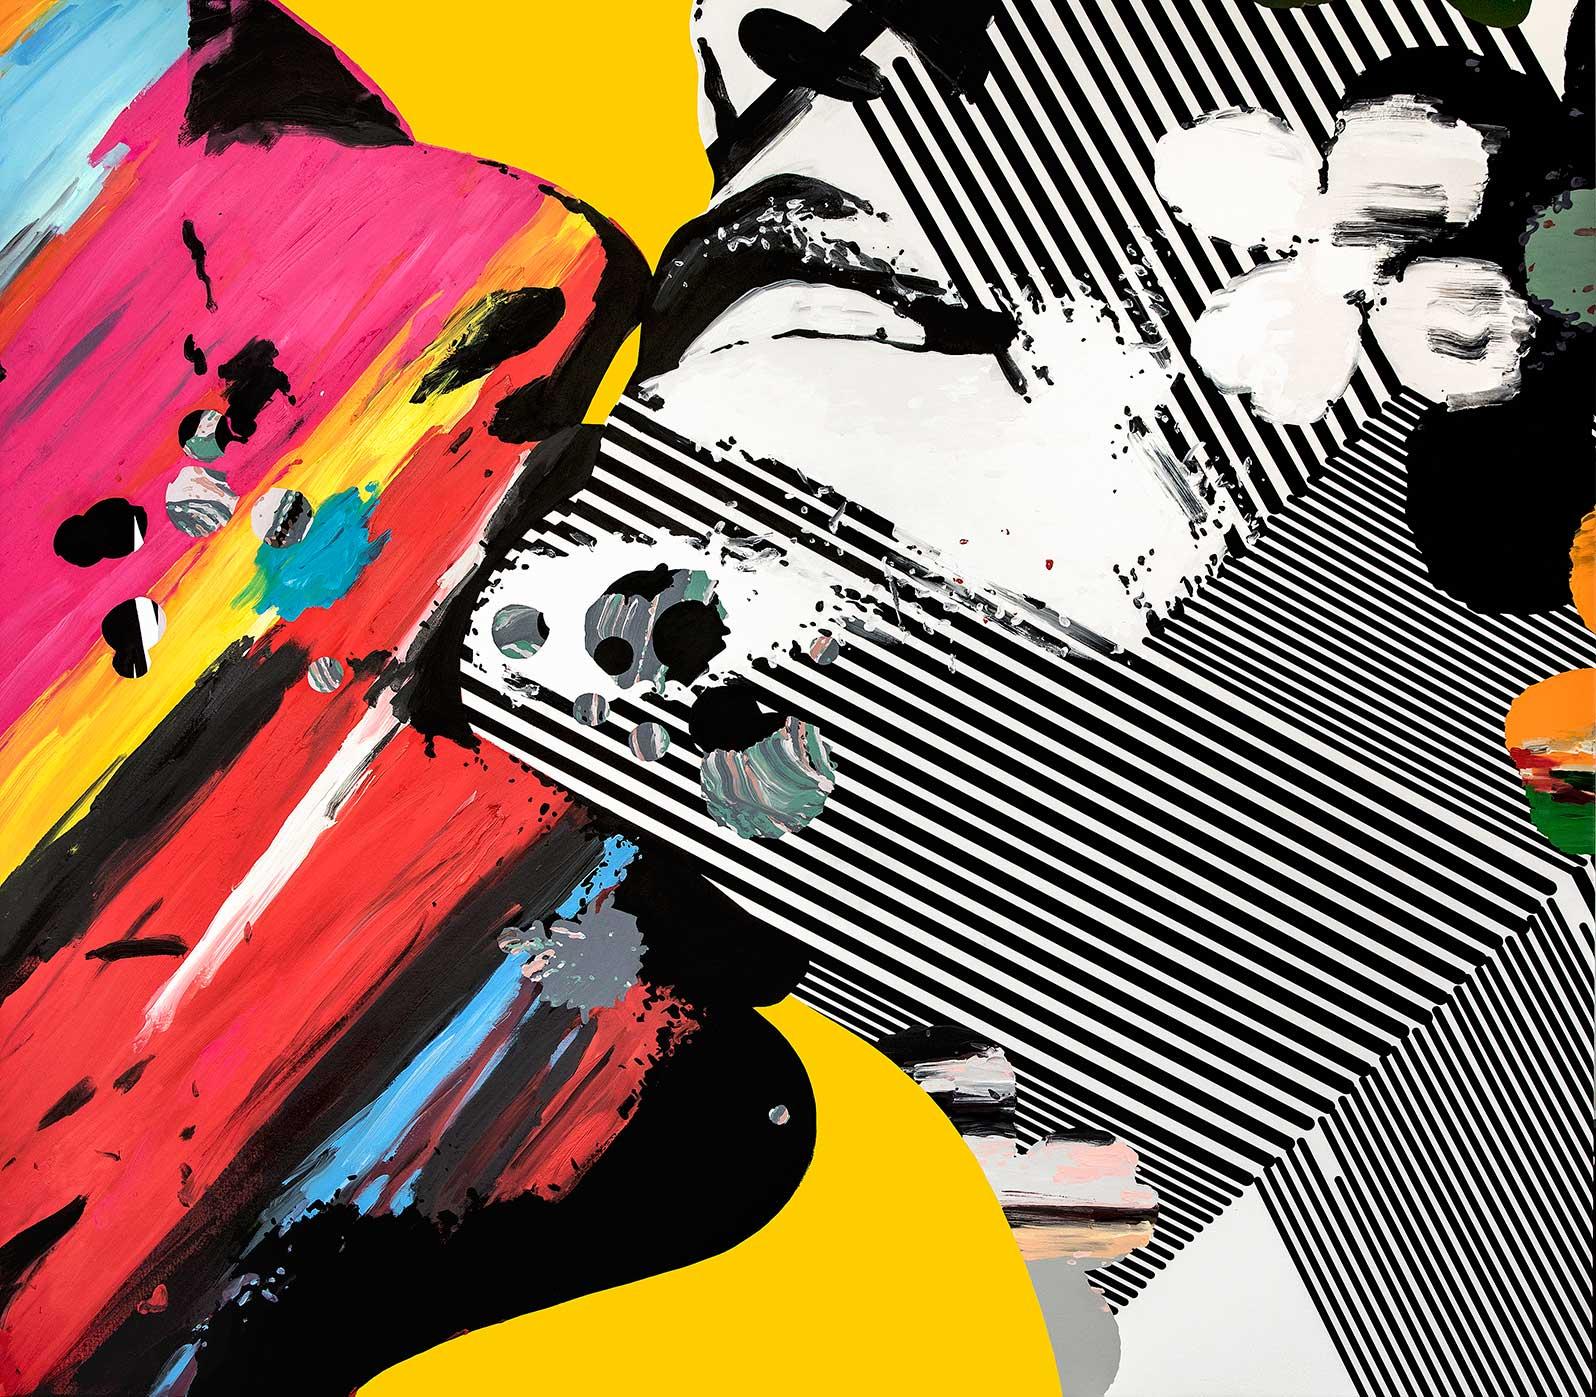 Anca Stefanescu | Mixed Media | AxiomOfChoice, Modern Art Acrylic Paintings